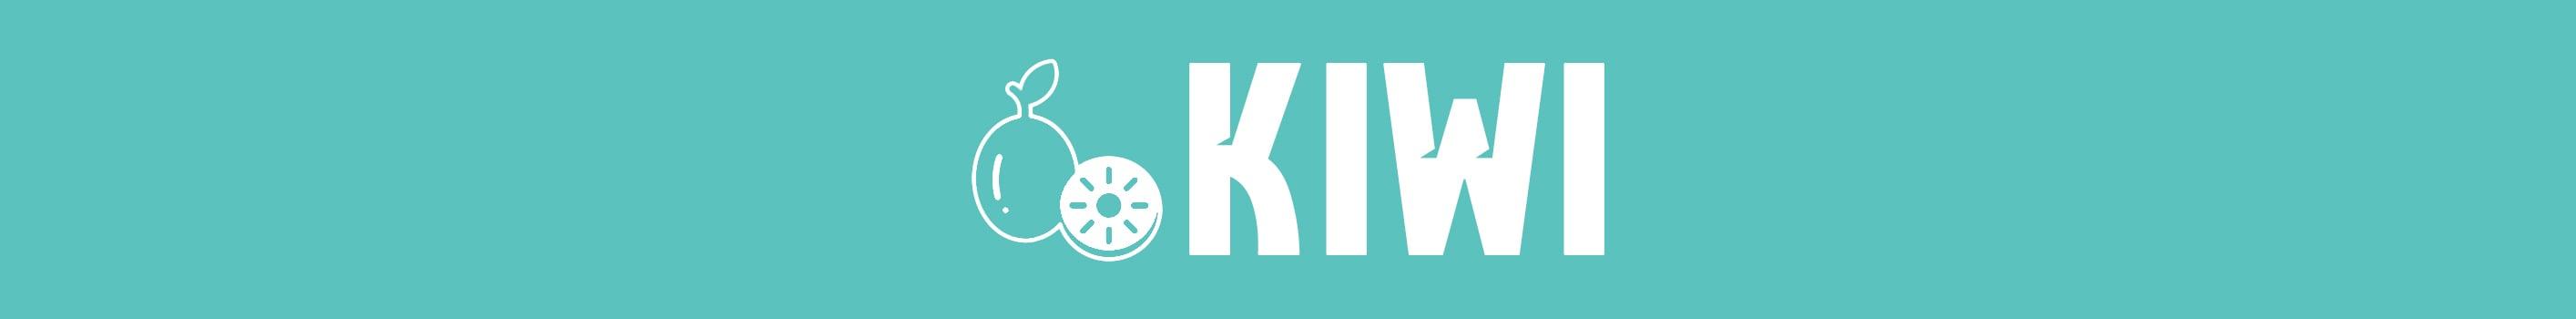 Kiwi E-Liquids